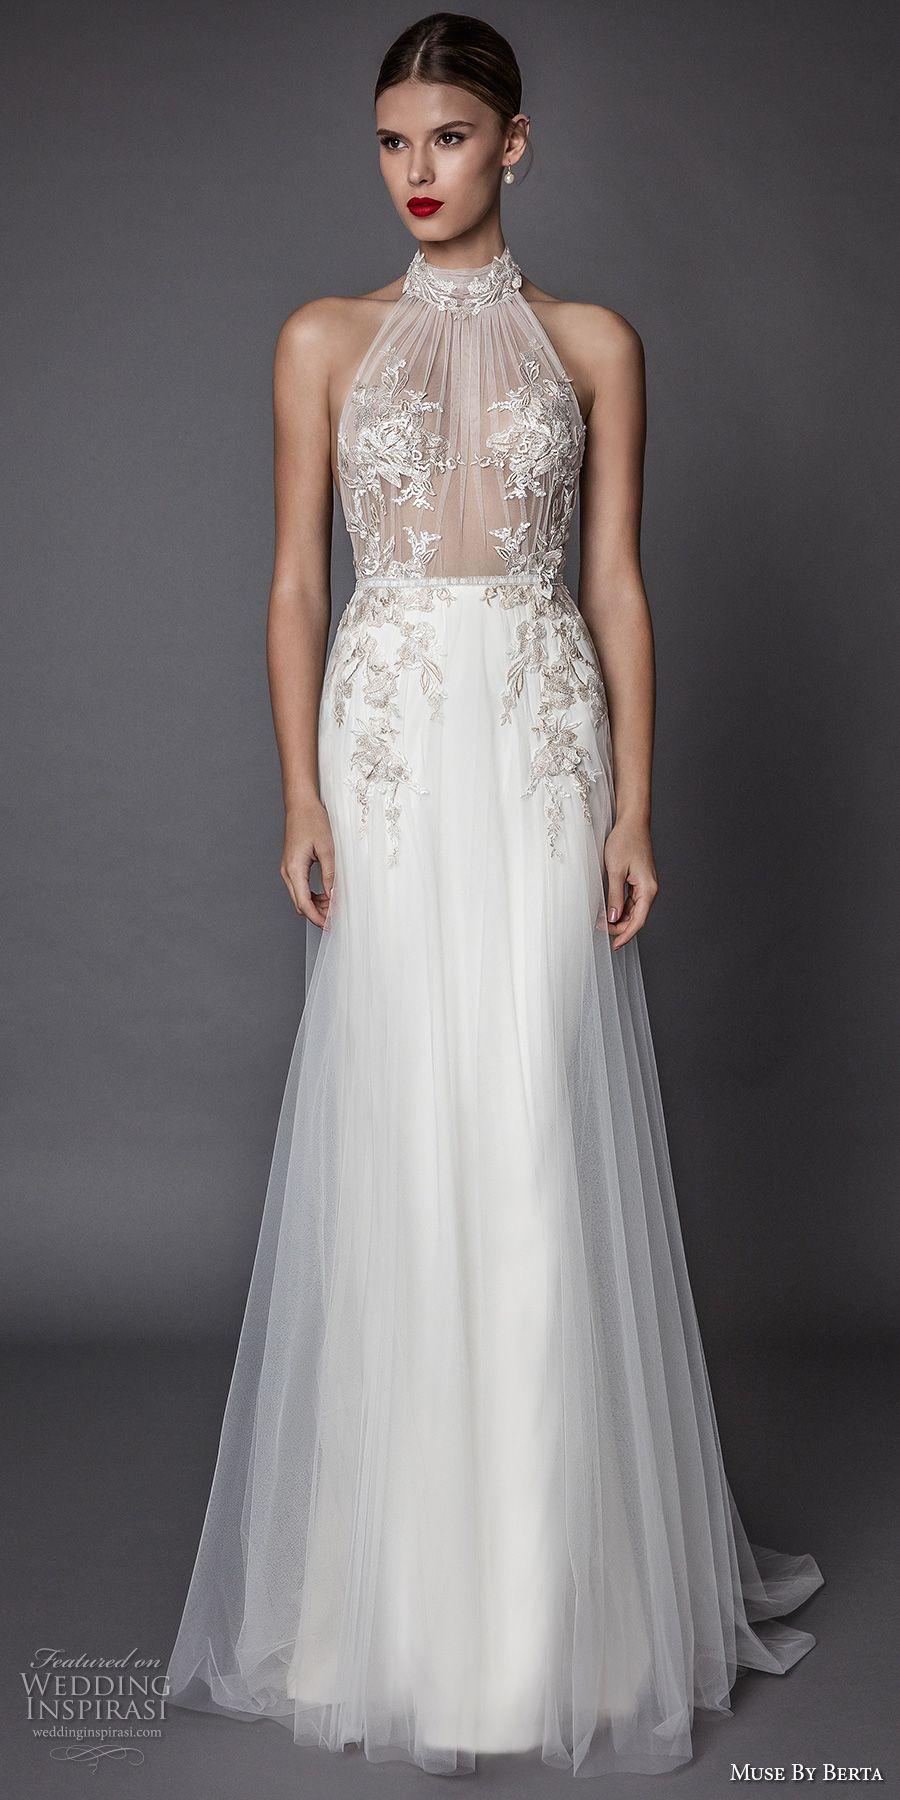 Muse by berta fall wedding dresses gowns pinterest halter